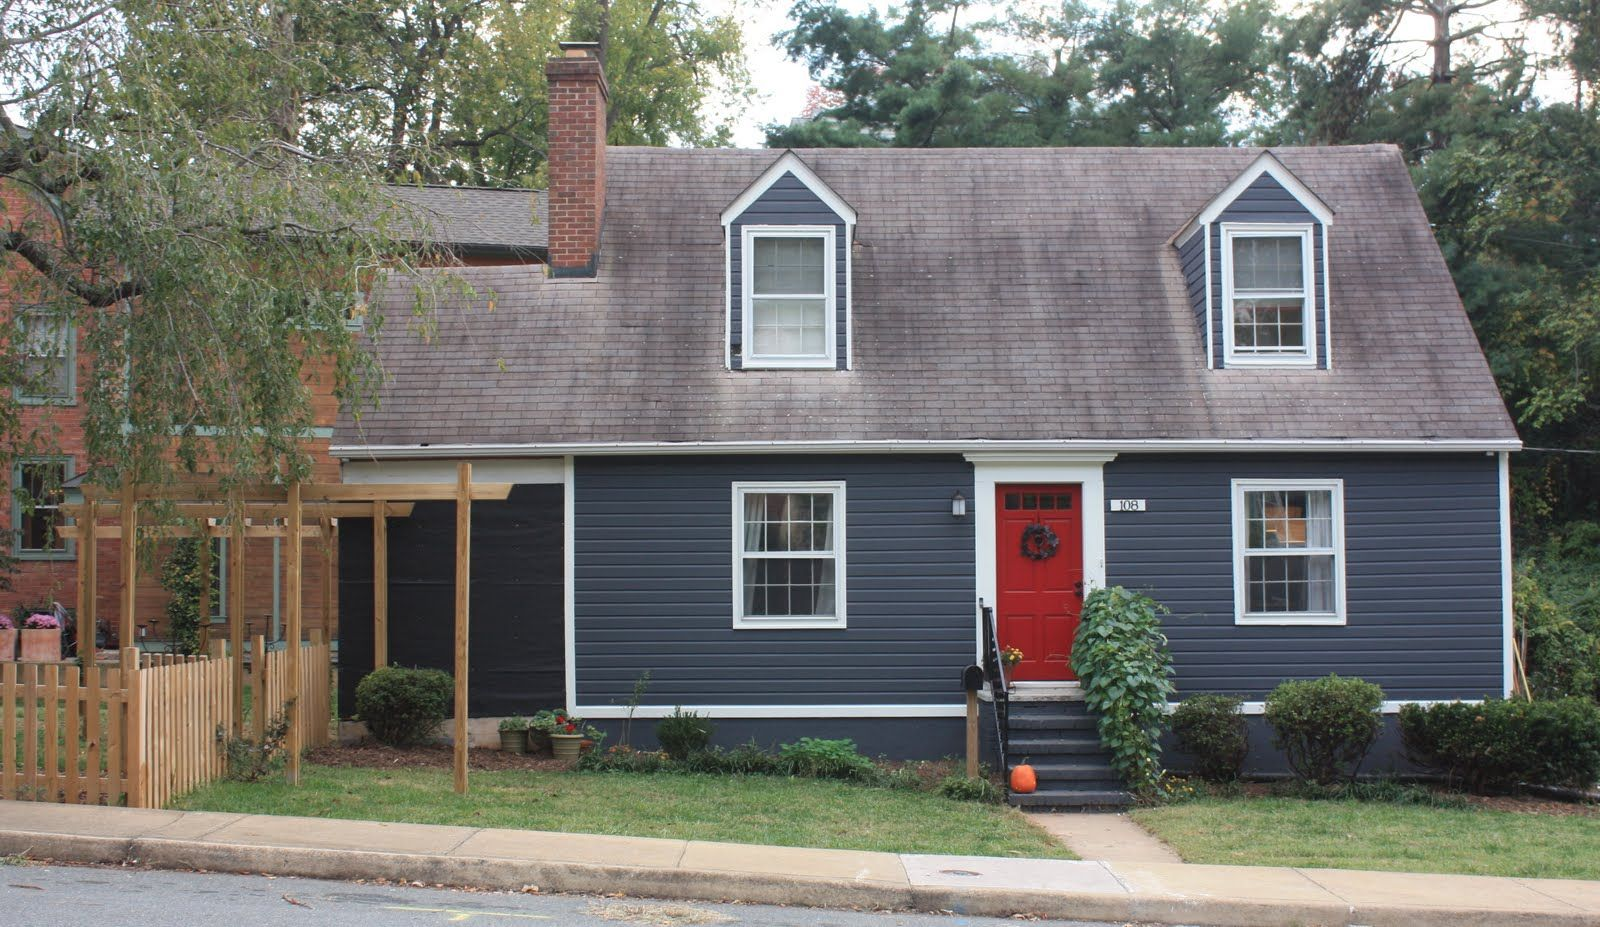 Blue House Red Door House Exterior Blue Red Door House